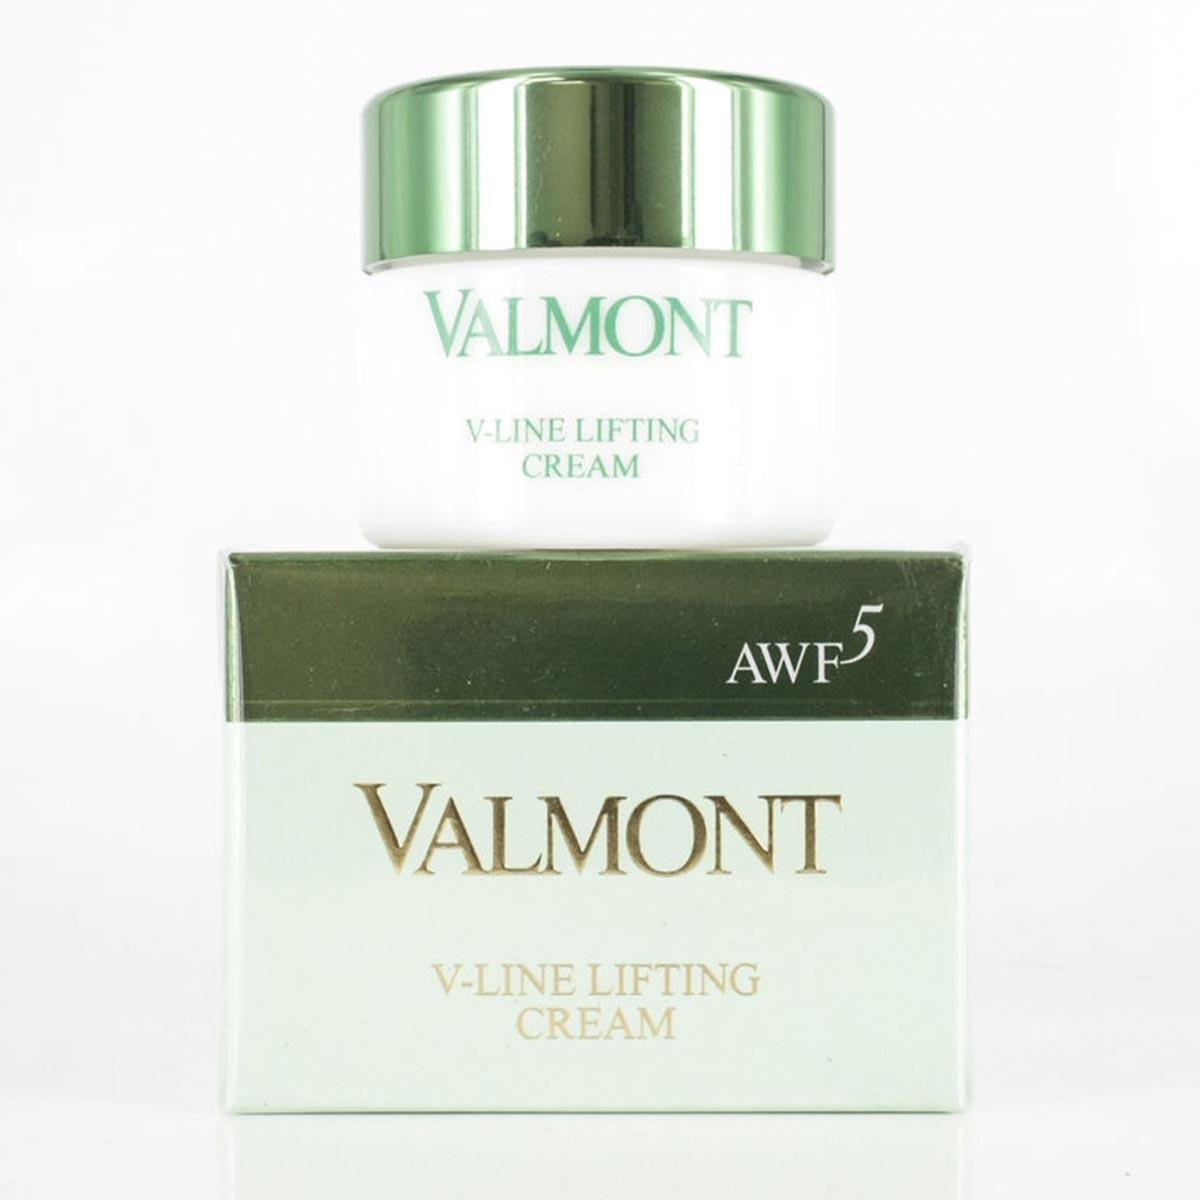 Valmont awf5 v line lifting cream 50ml